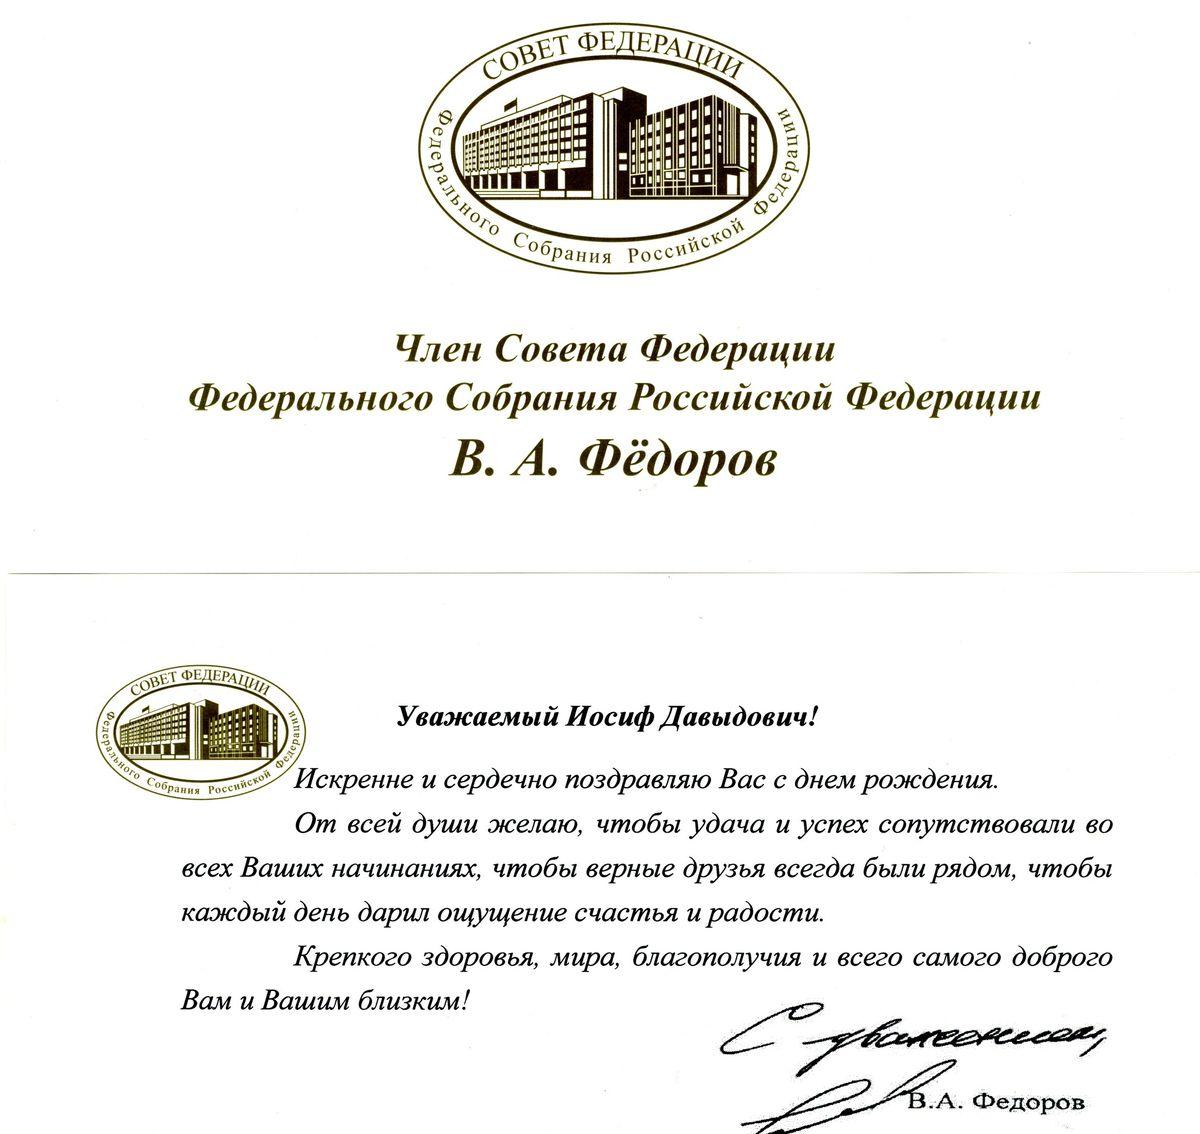 Поздравление от совета федерации 887